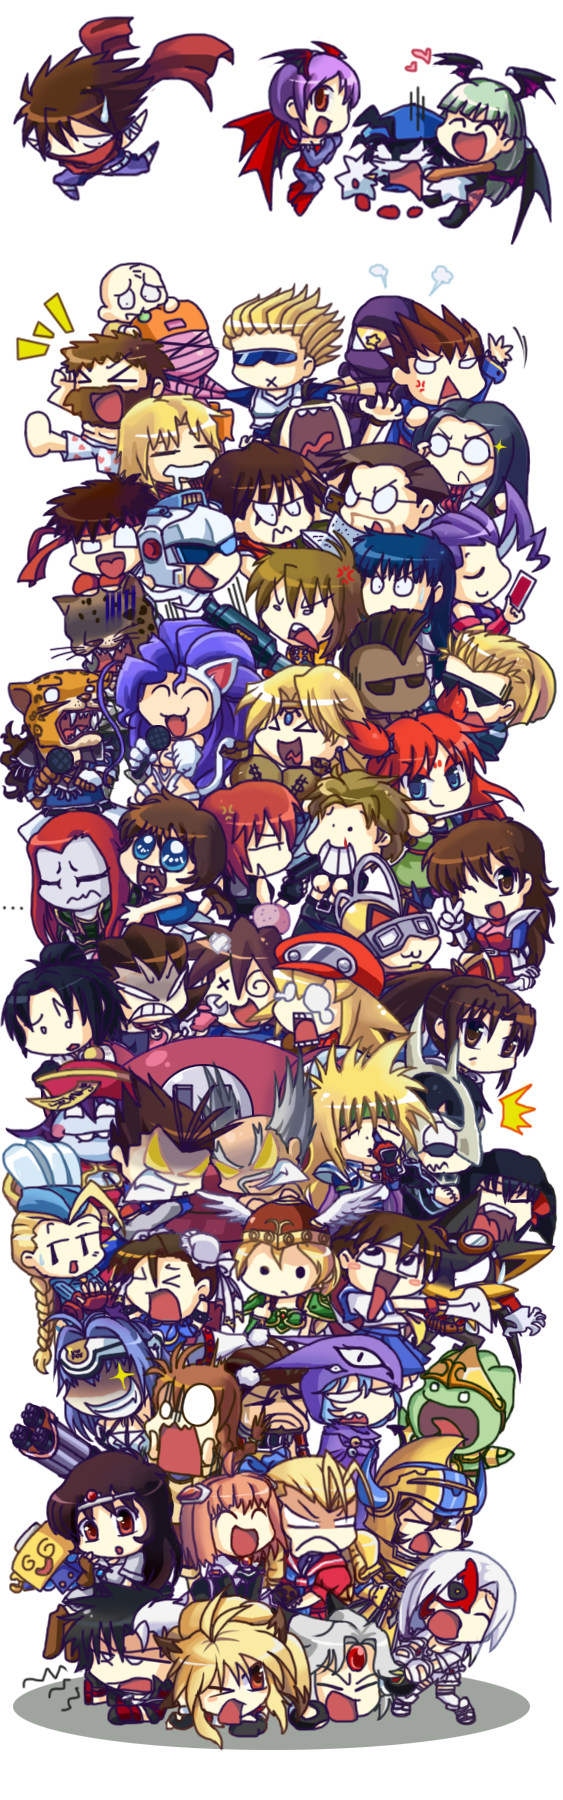 Namco X Capcom Chibis Bundle by PhuiJL